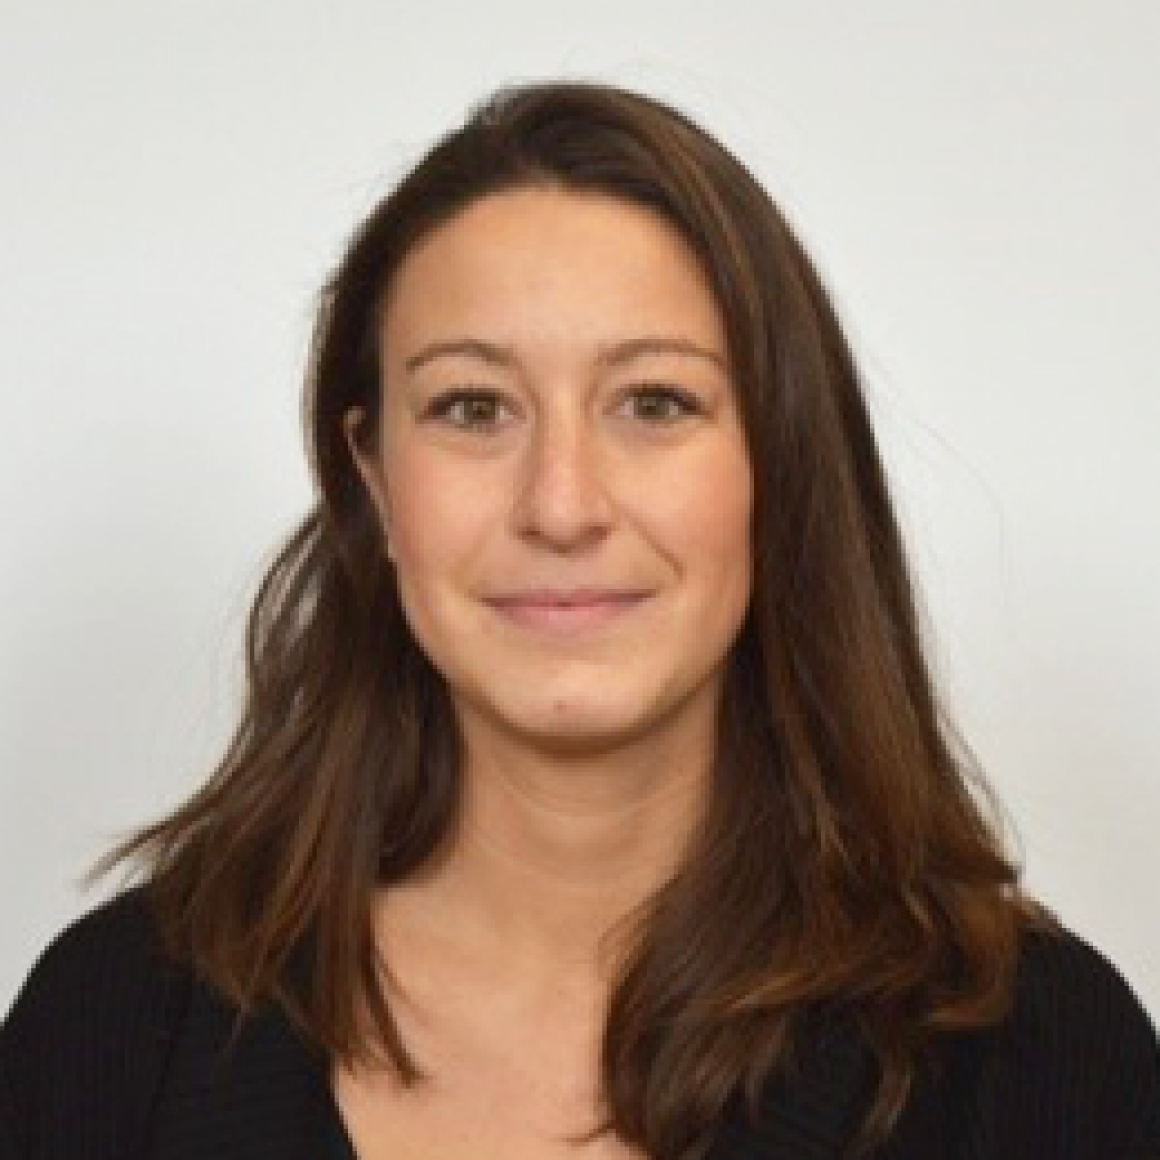 Jatc Greece Partner14 Alessandra Lugo